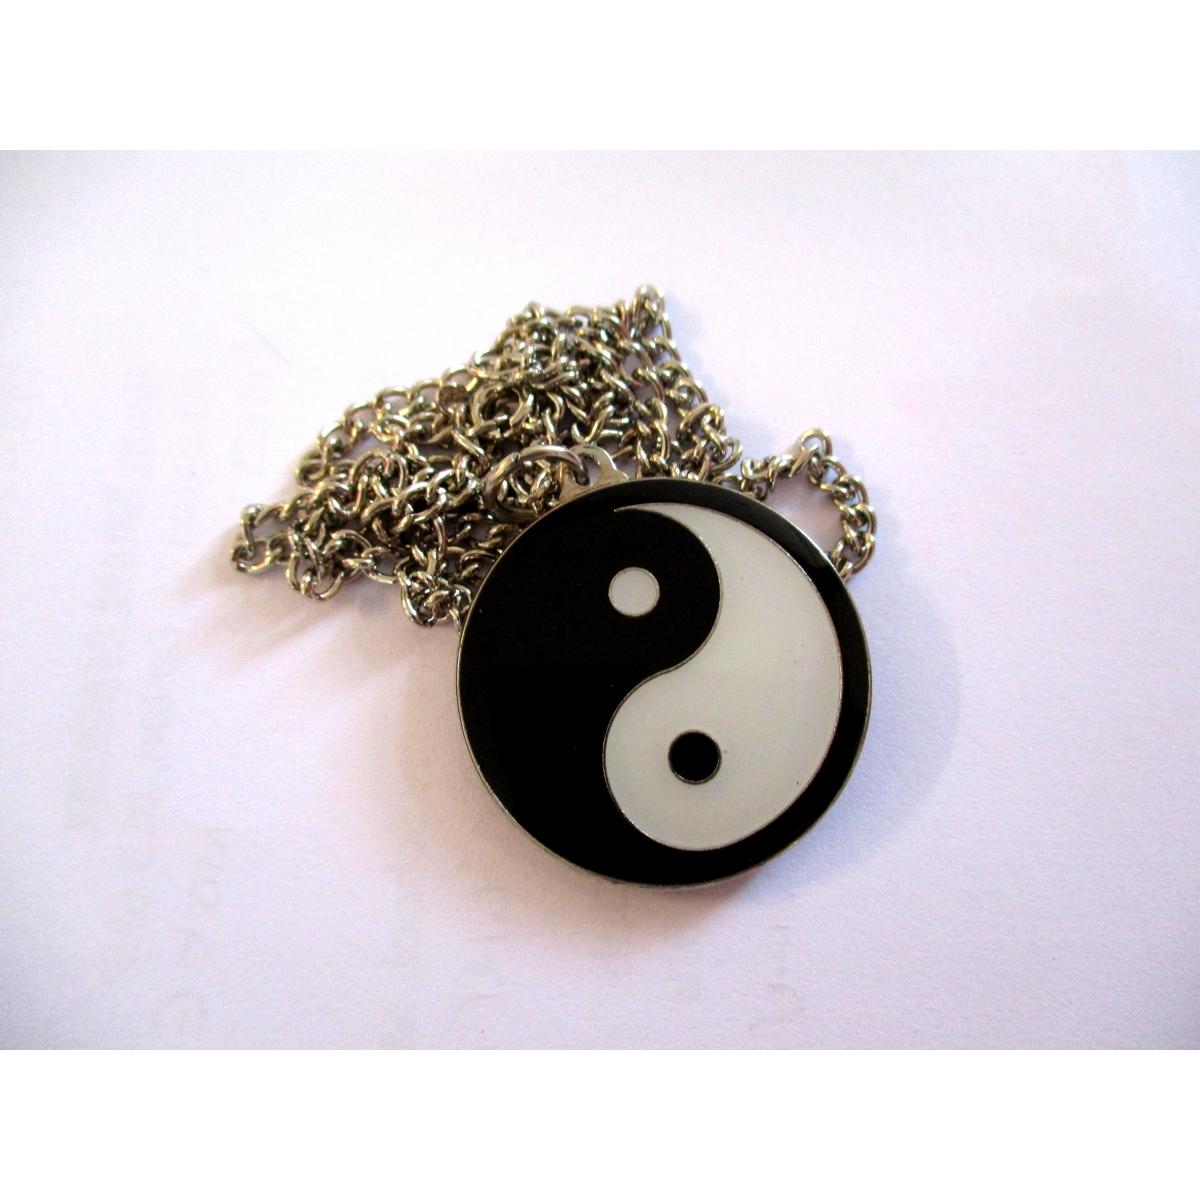 Ying Yang Necklace